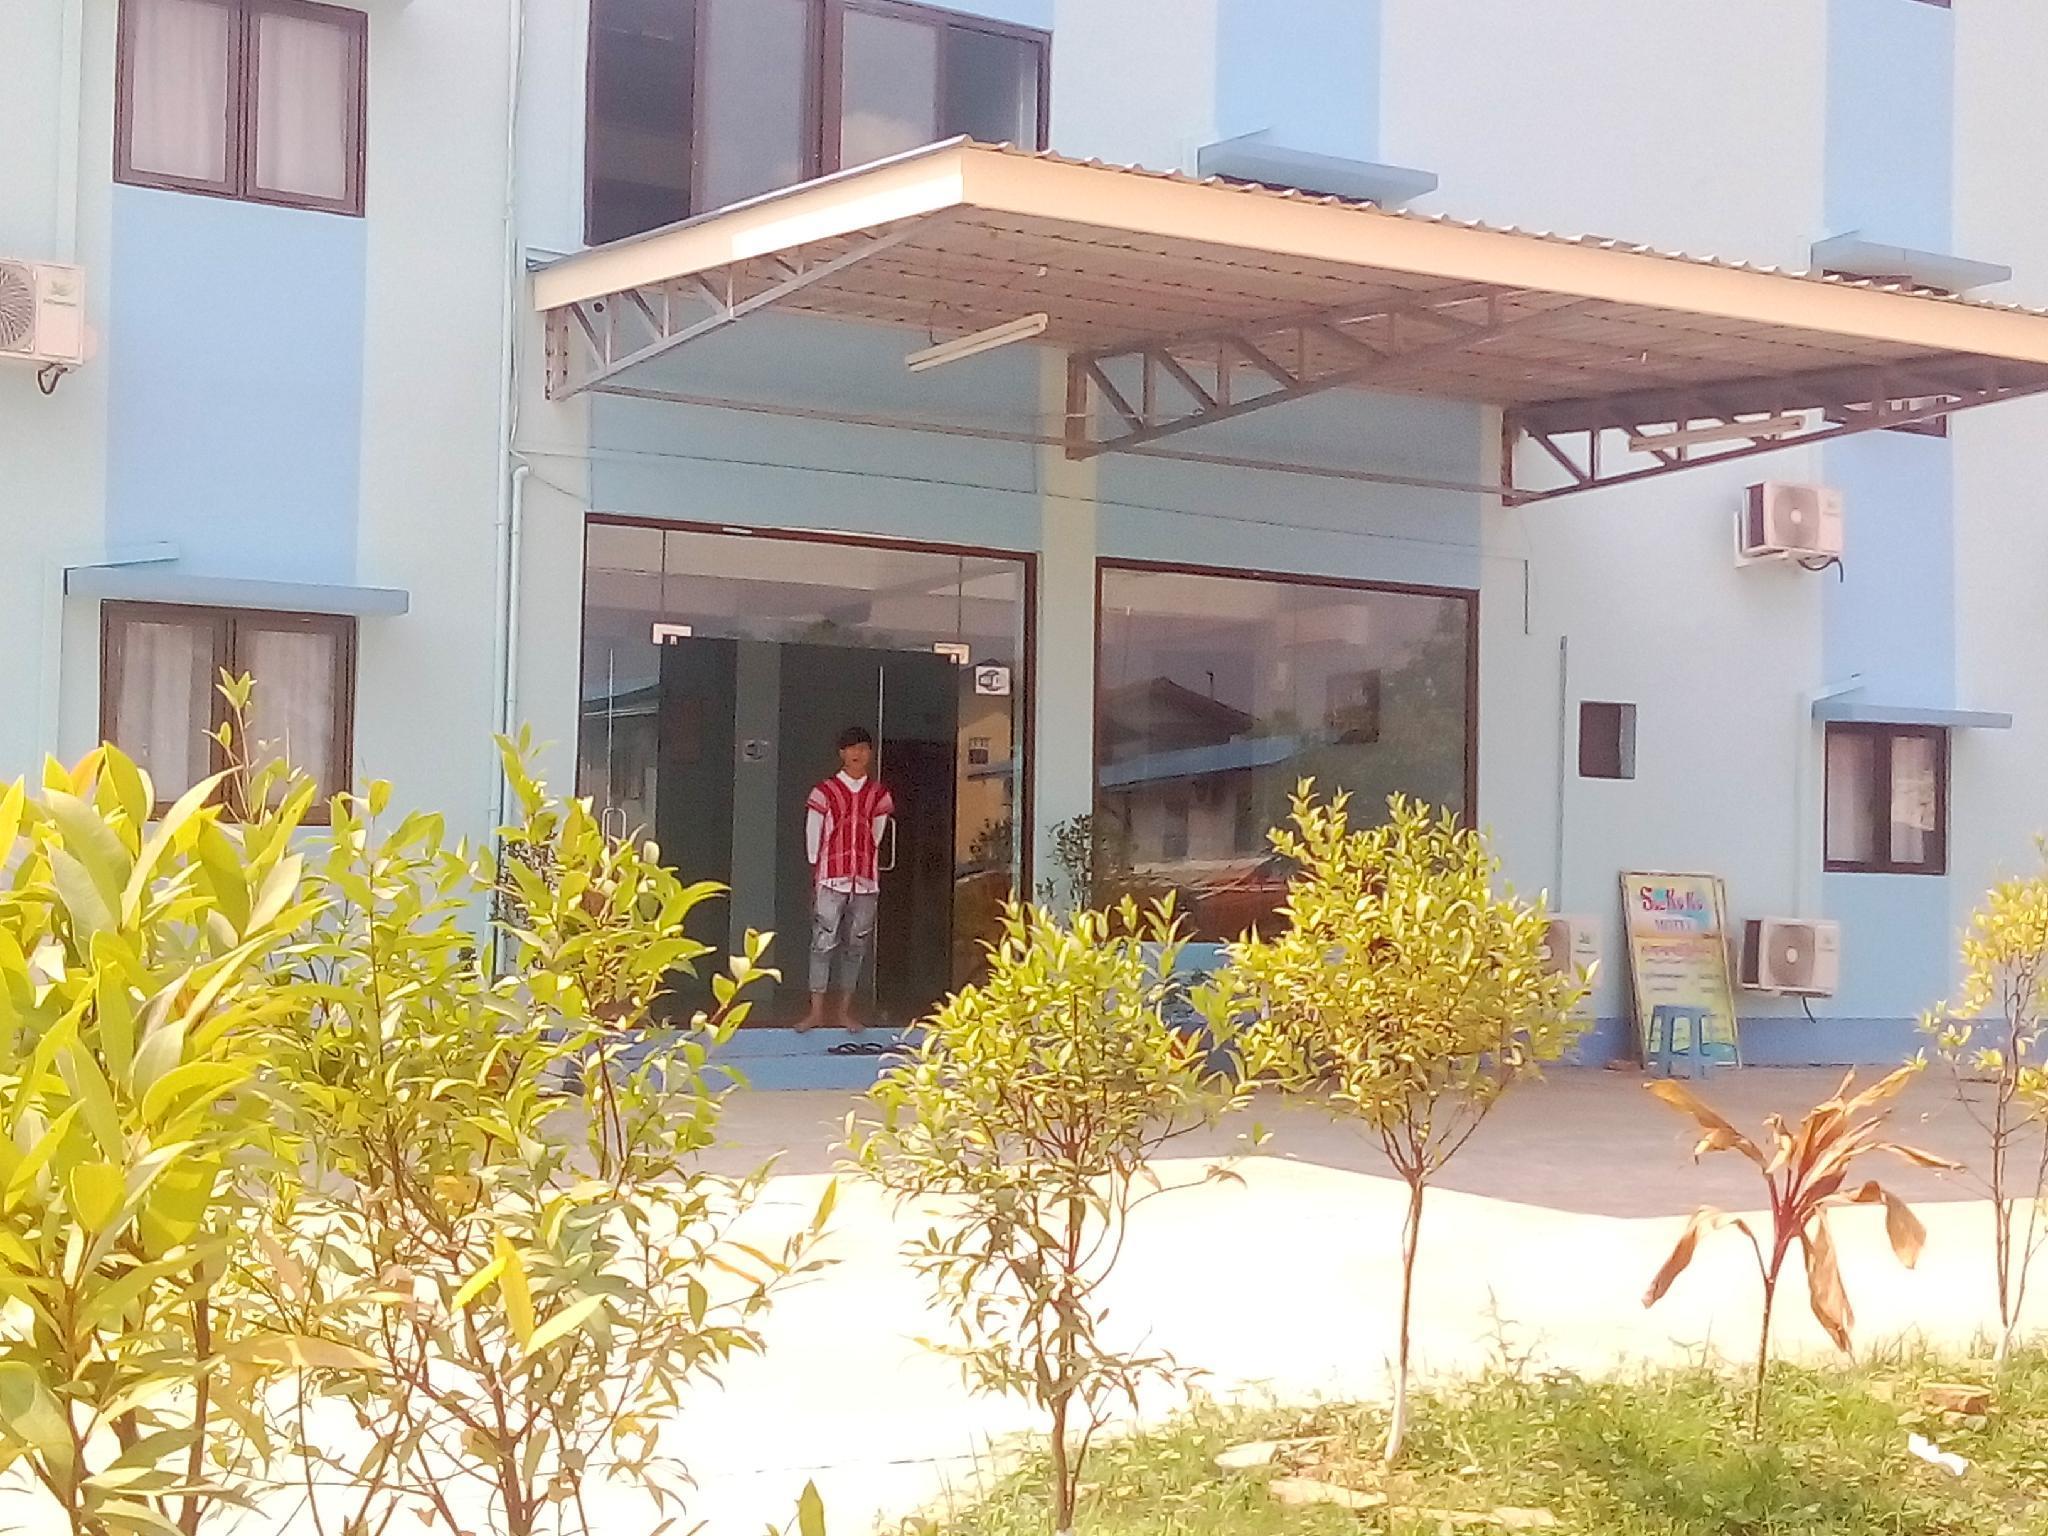 Soe Ko Ko Motel Hpa An